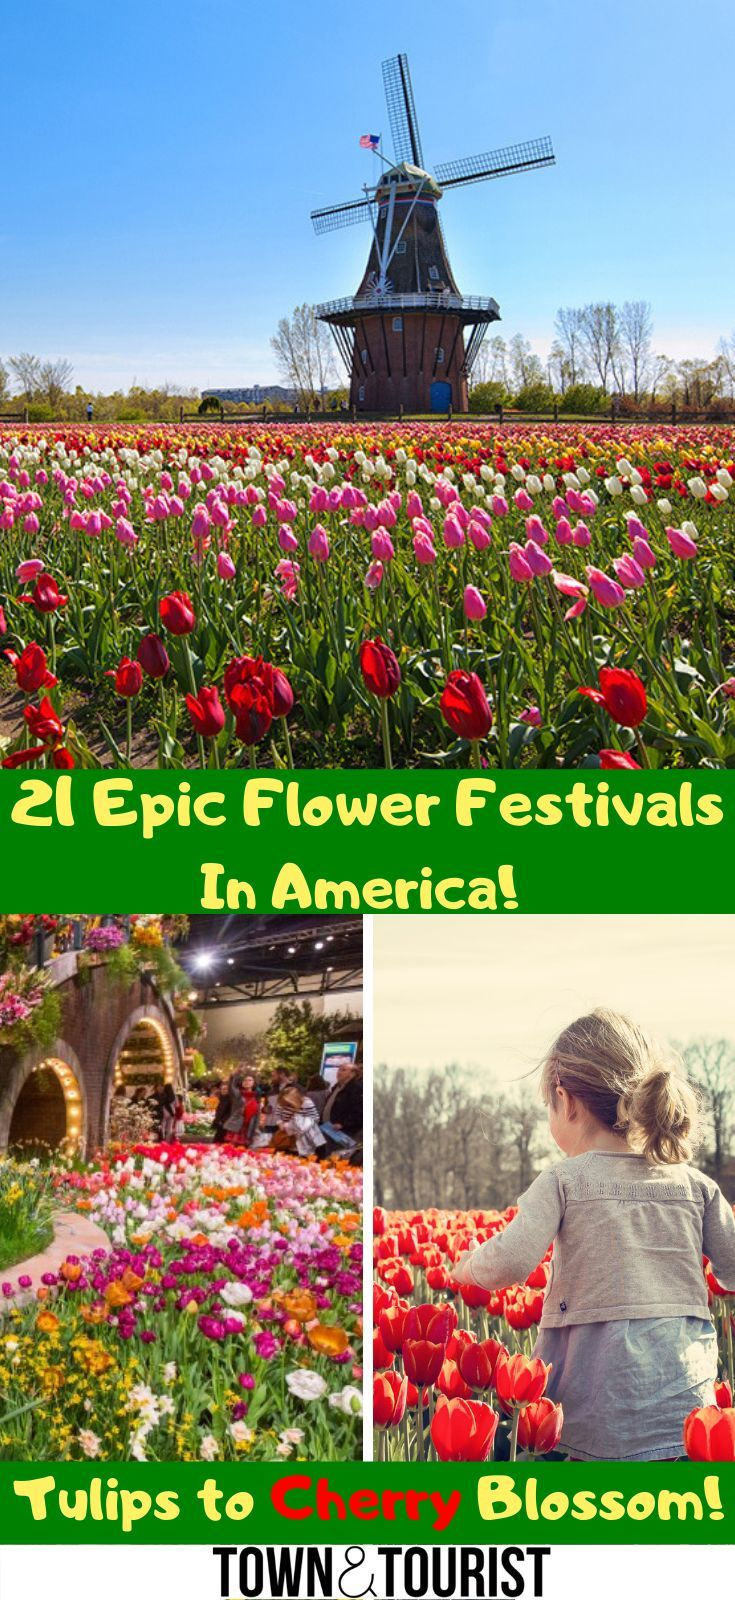 21 Epic Flower Festivals in America, Best Flower Shows USA